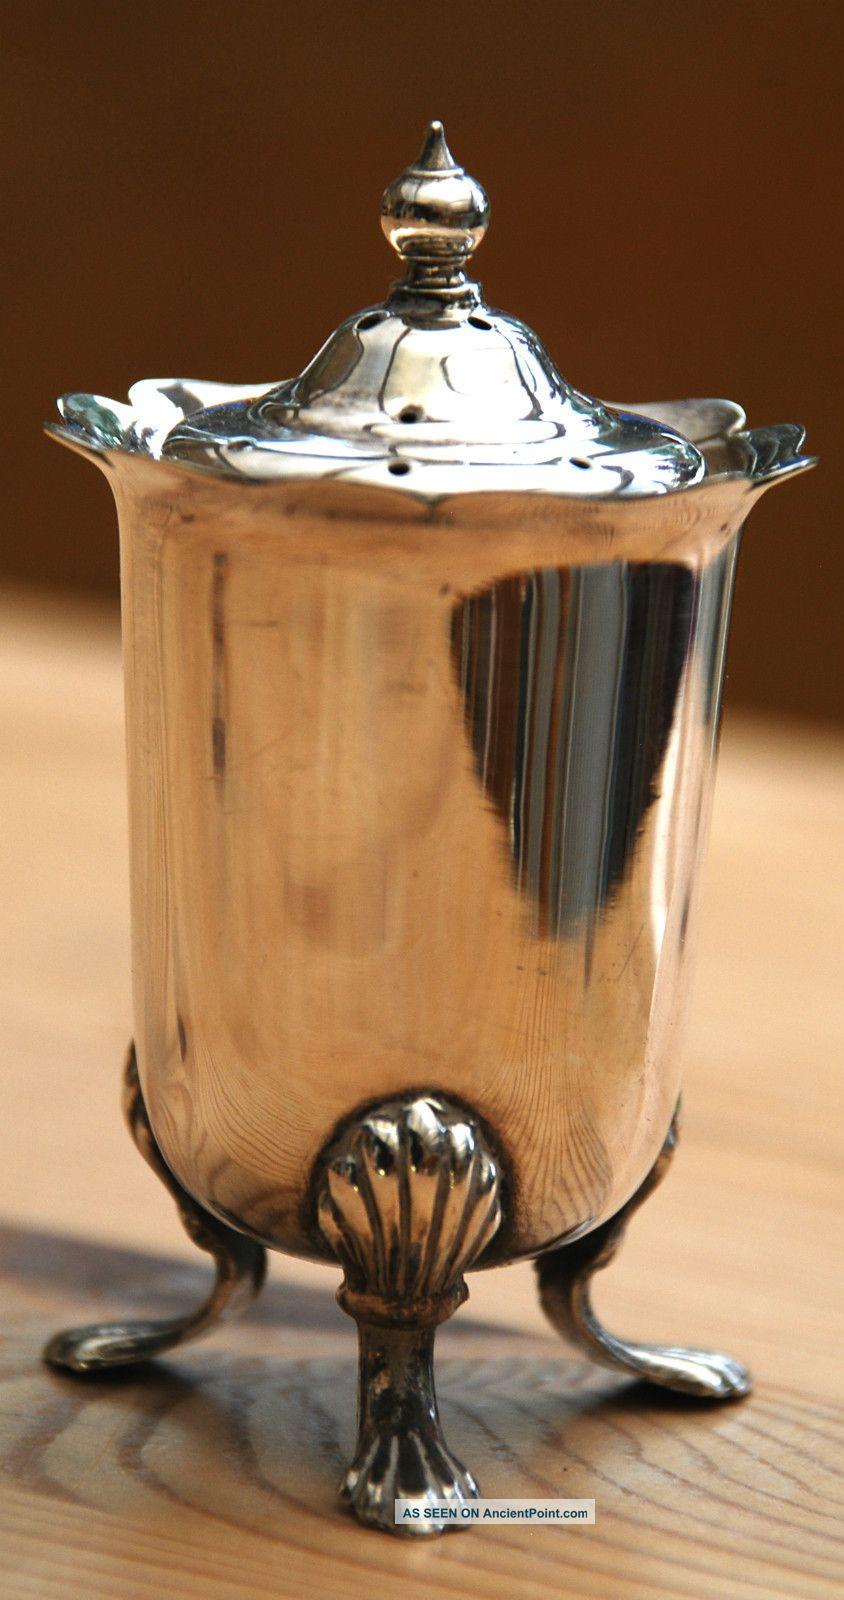 Silver Plate Salt Cellar Salt & Pepper Cellars/ Shakers photo